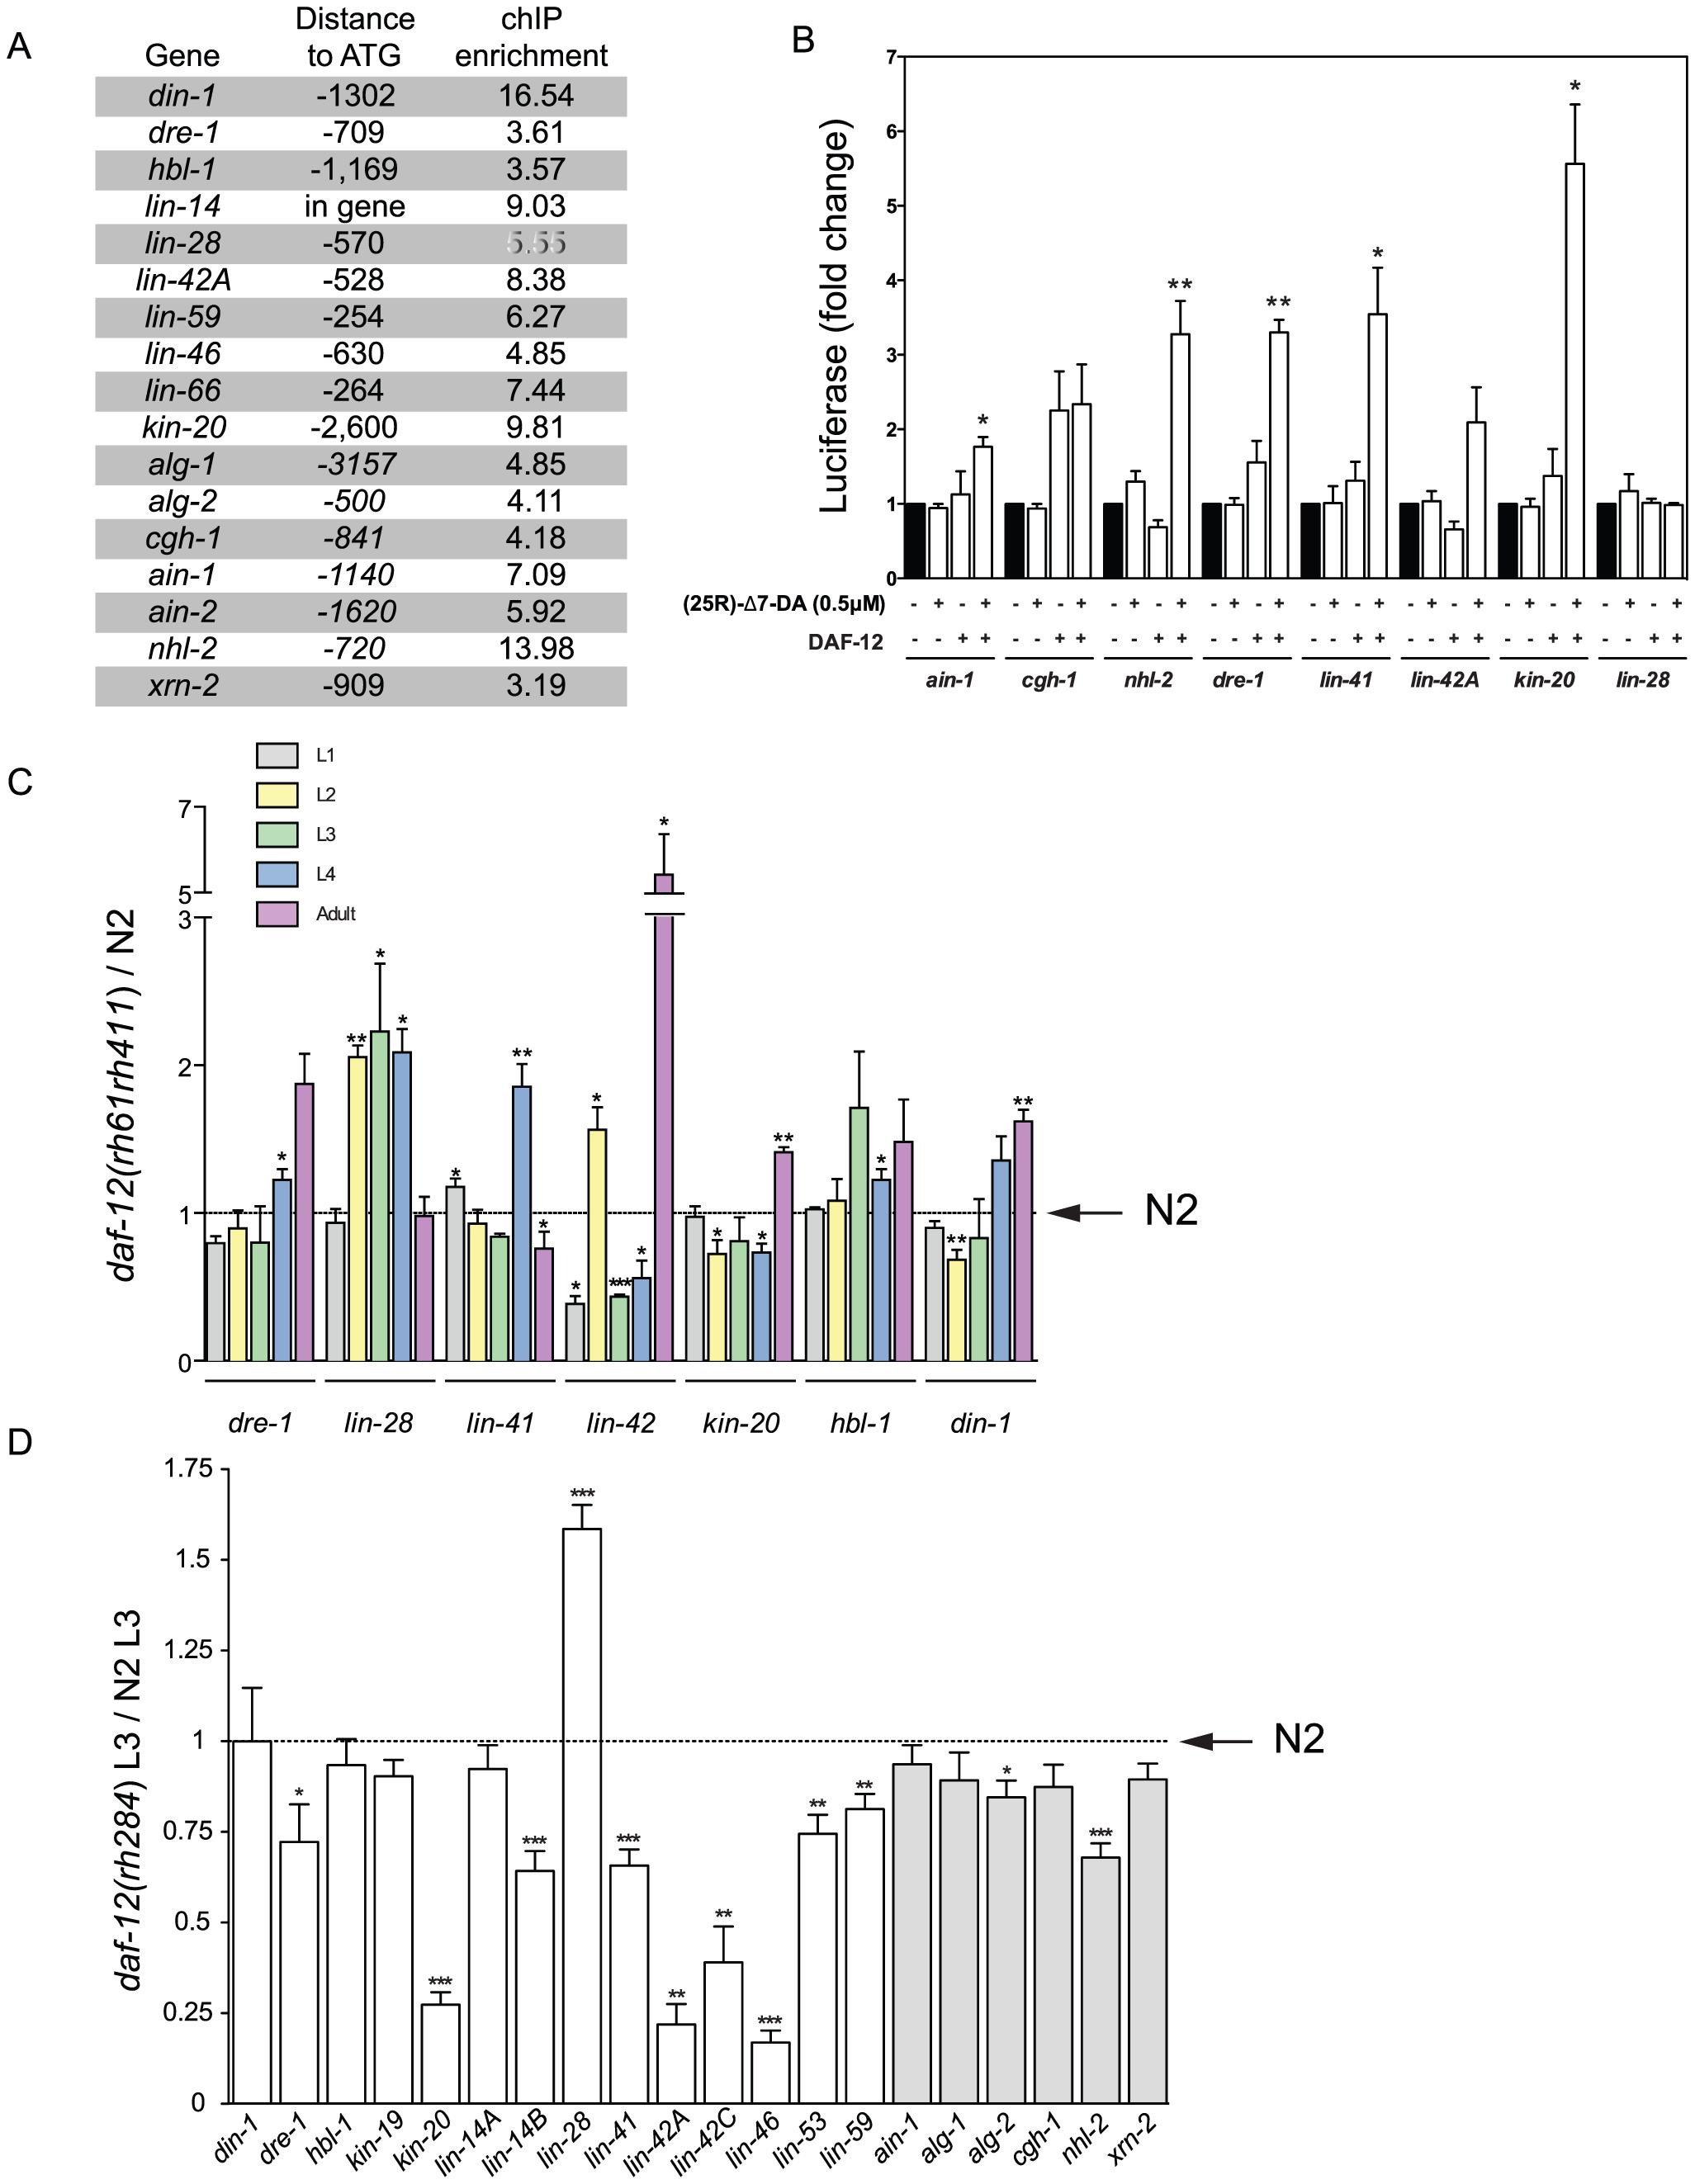 DAF-12 regulates heterochronic and miRISC gene expression.